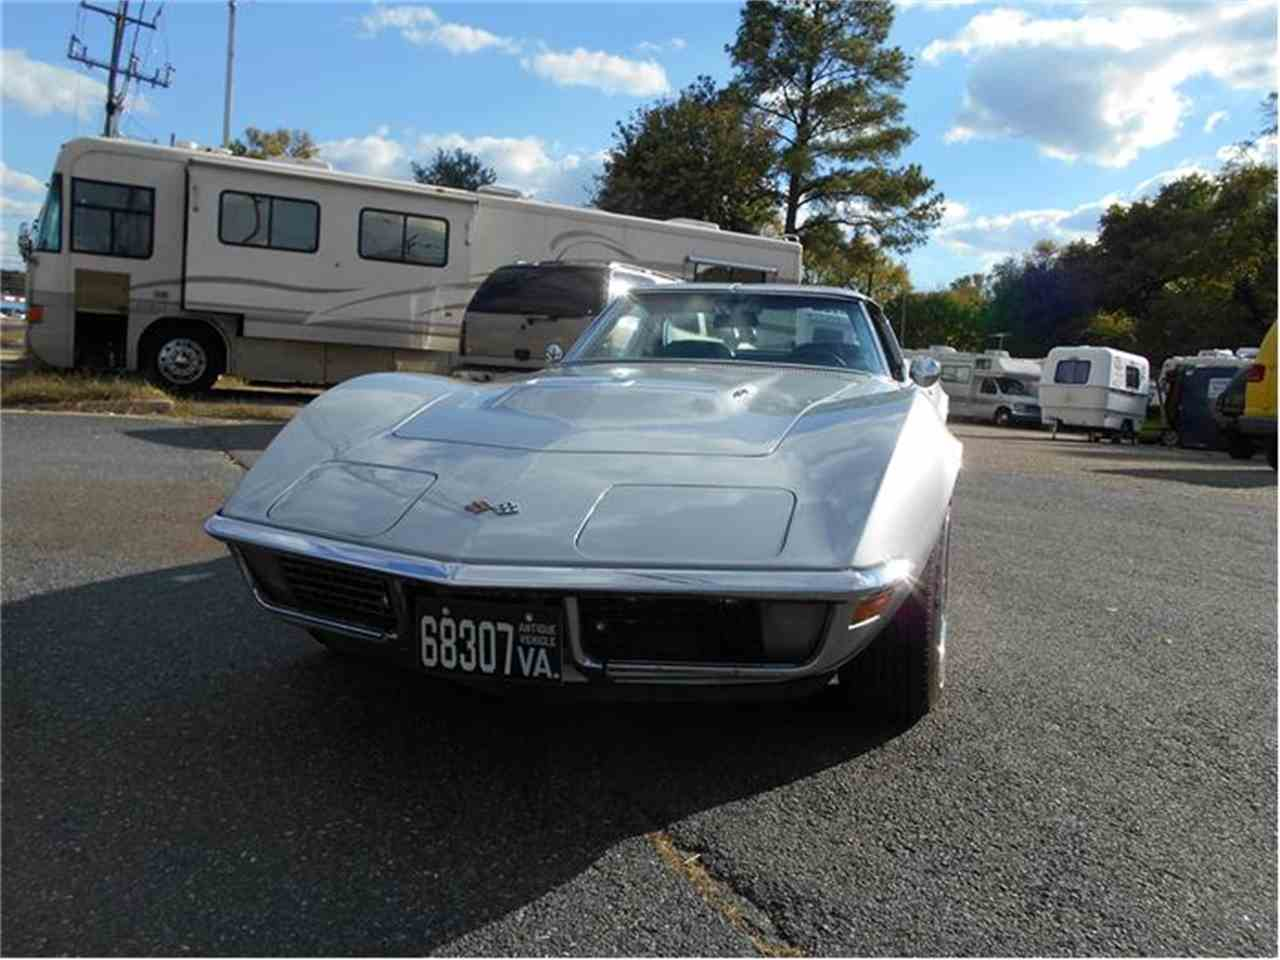 Auto For Sale Fredericksburg Va: 1970 Chevrolet Corvette Stingray For Sale